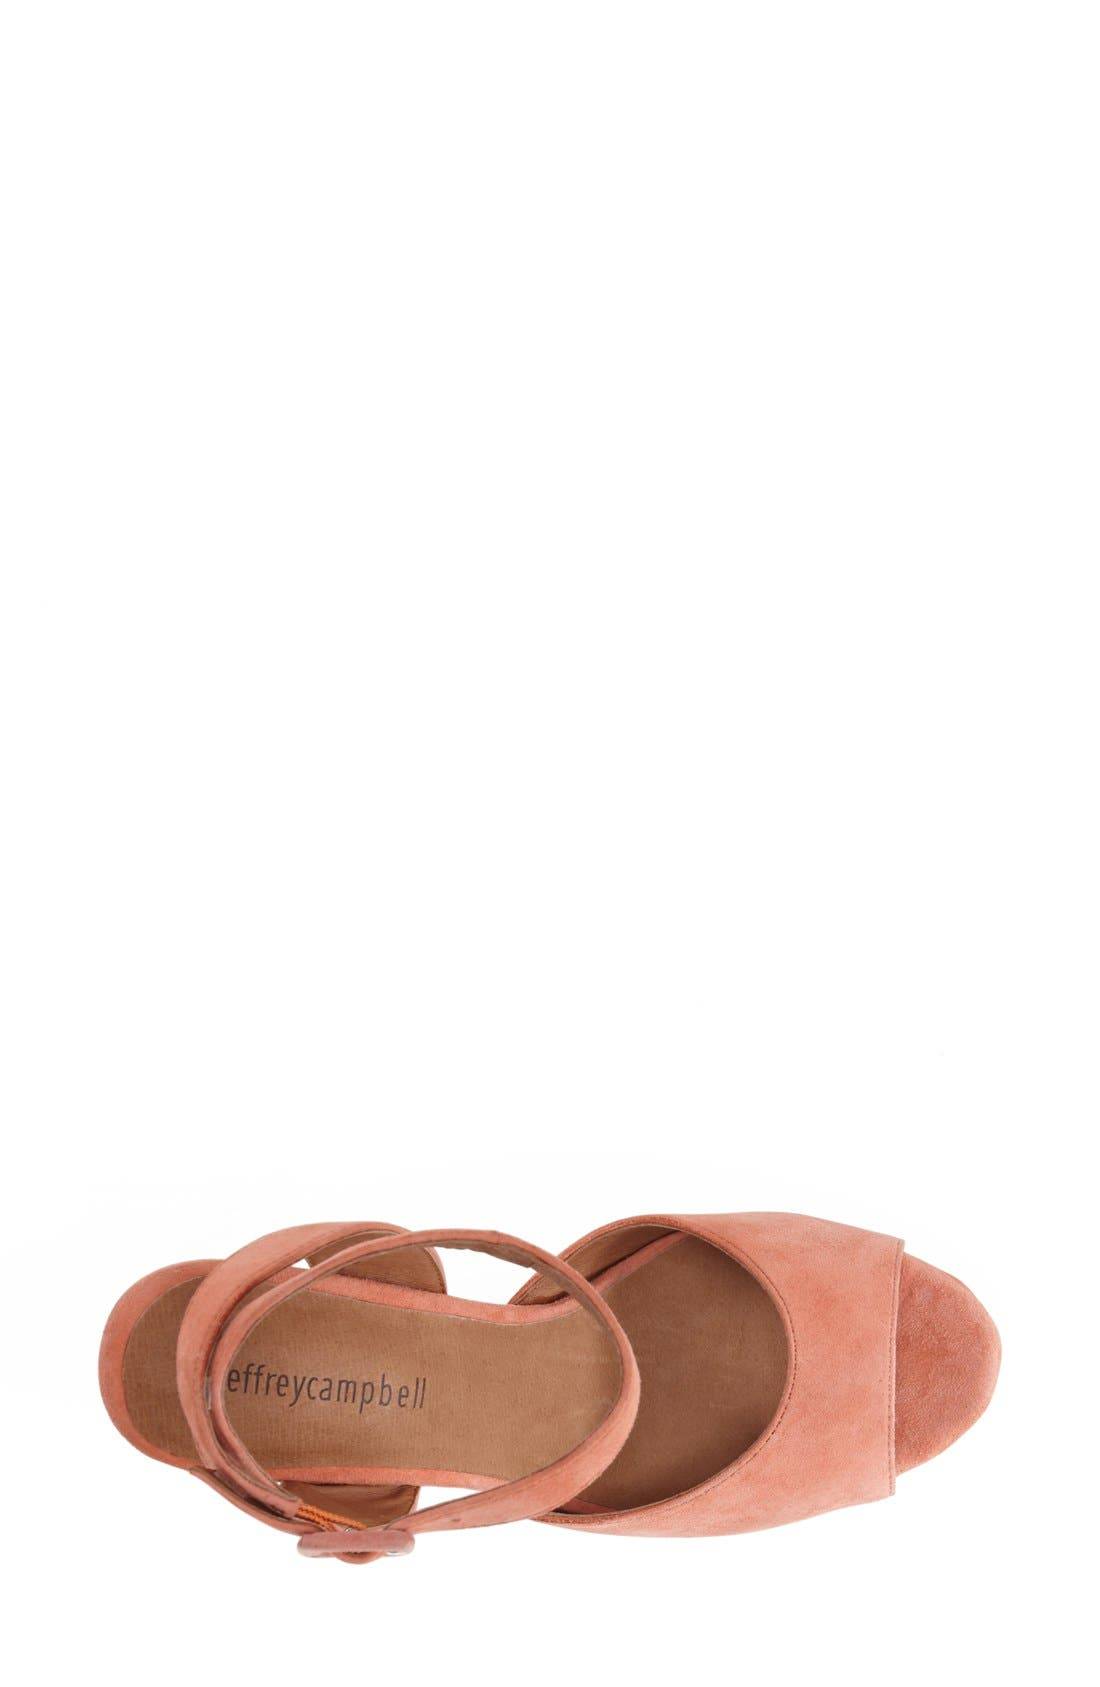 Alternate Image 3  - Jeffrey Campbell 'Sassy' Wood Platform Sandal (Women)